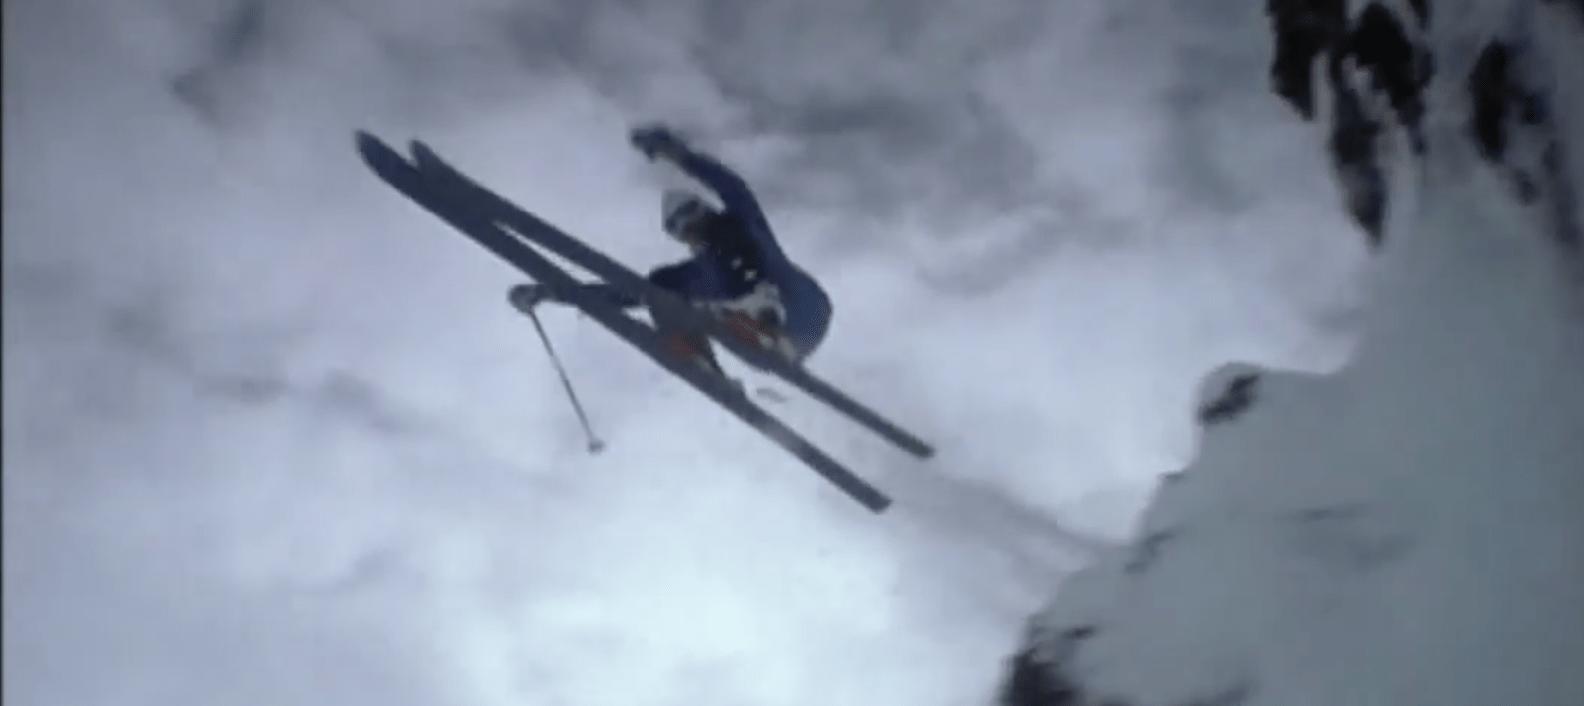 hotdog, ski movie, movie